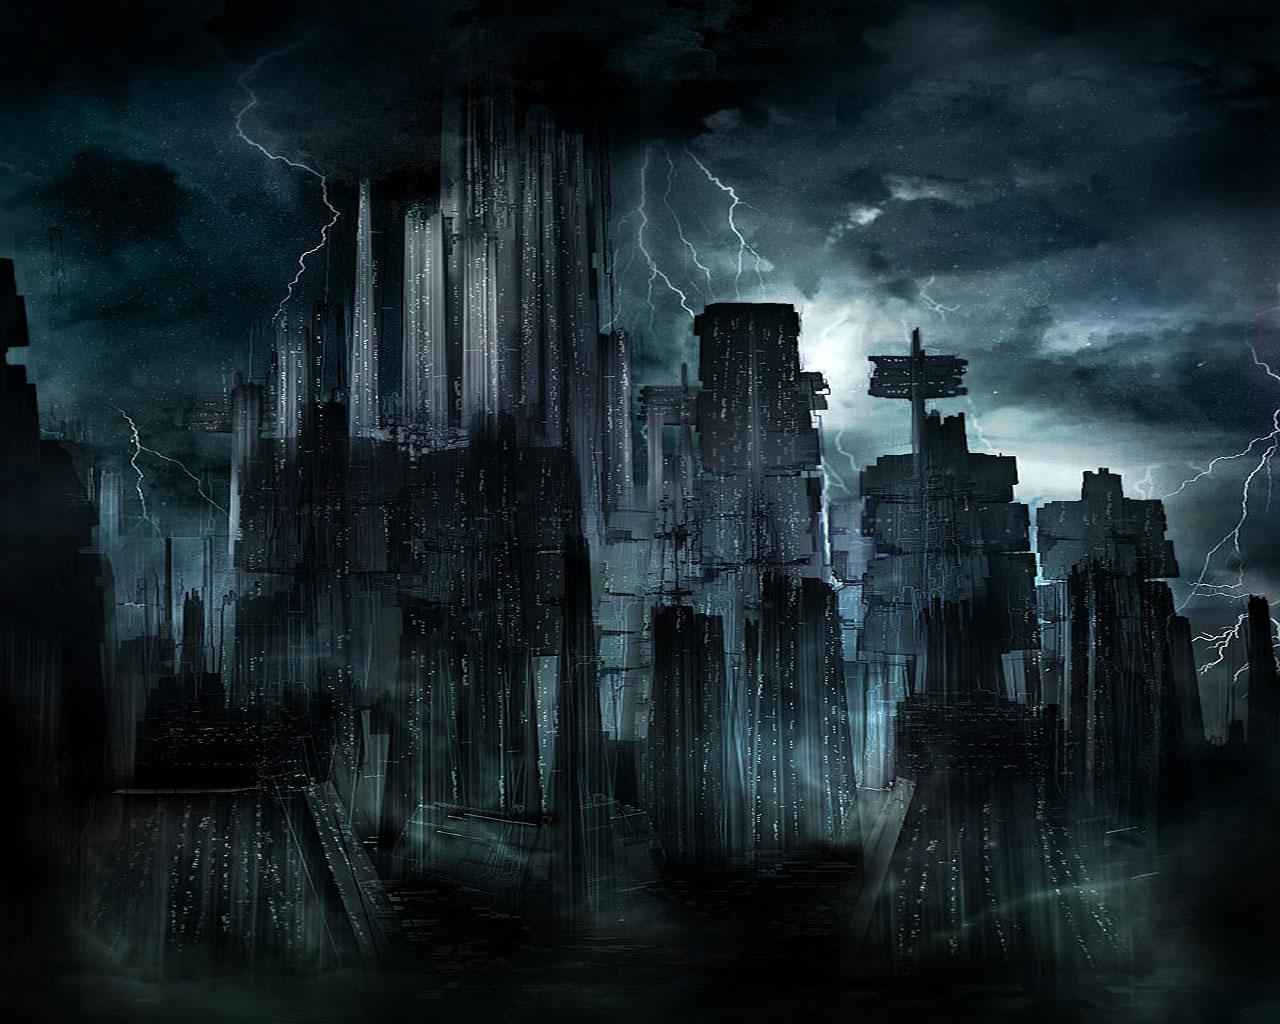 Dark city wallpaper Wallpaper Wide HD 1280x1024